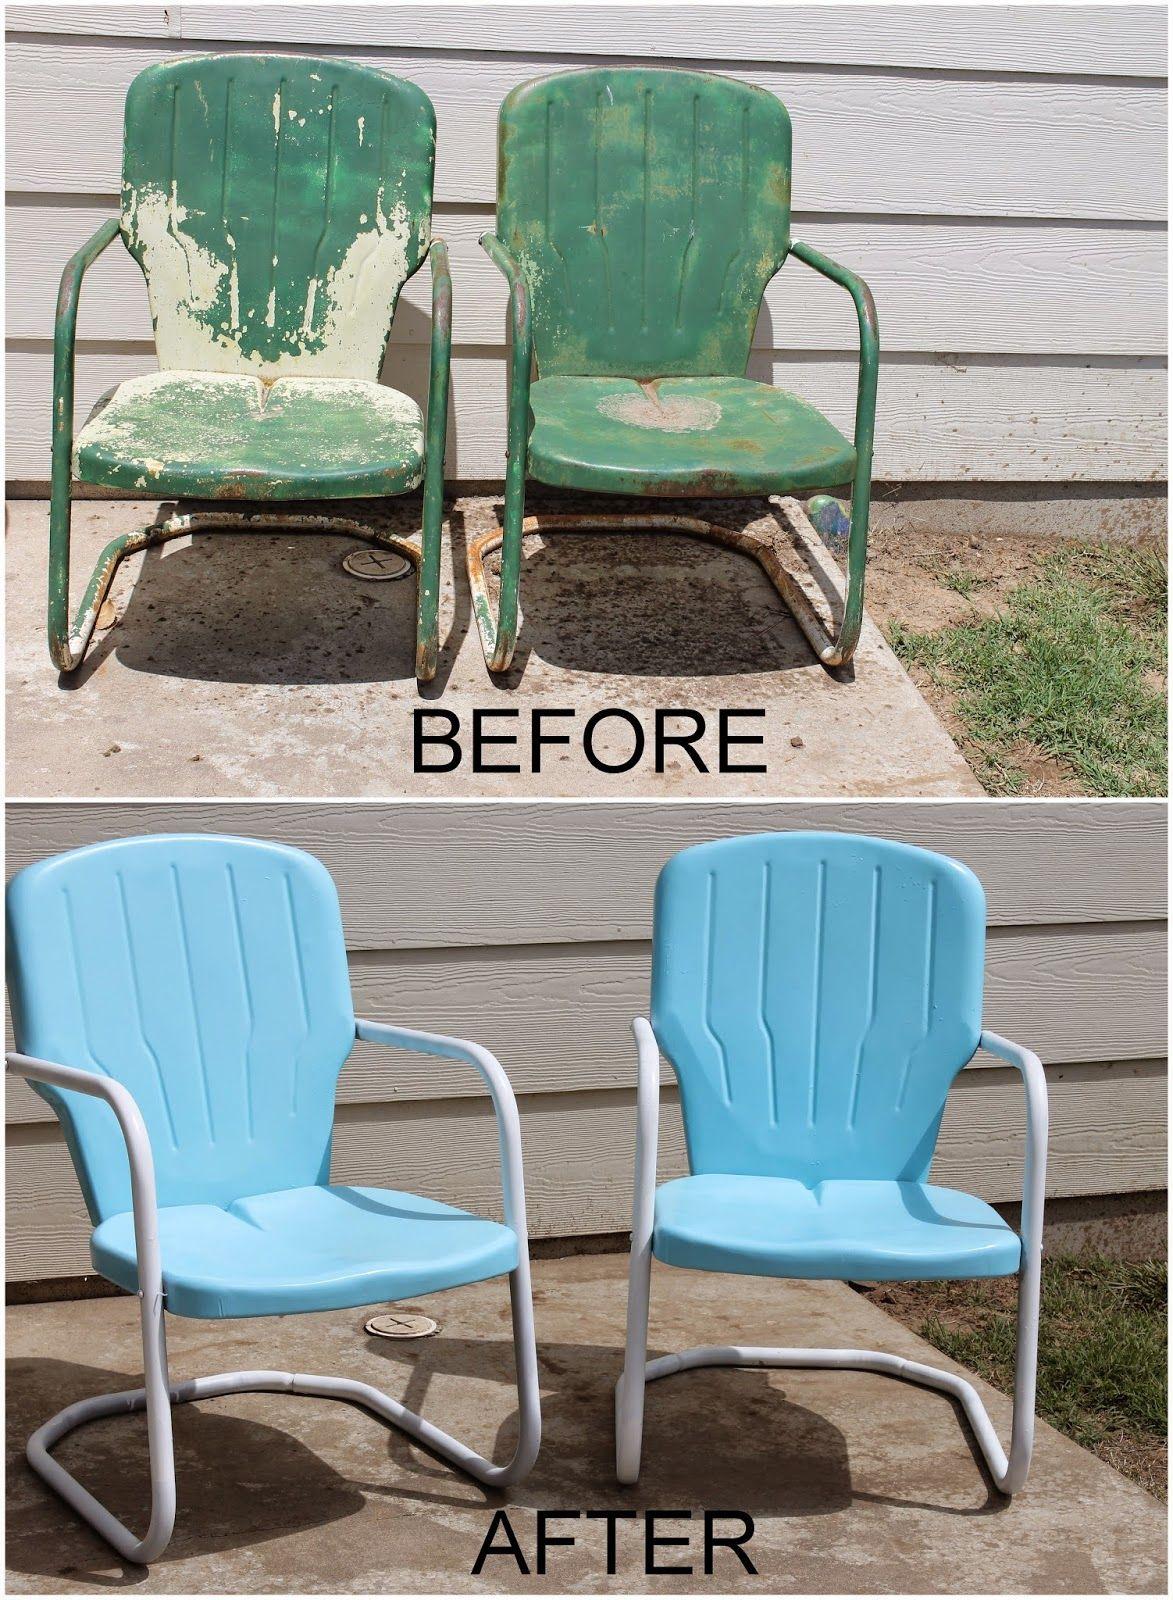 old metal chairs knee chair ikea repaint patio diy paint outdoor motel